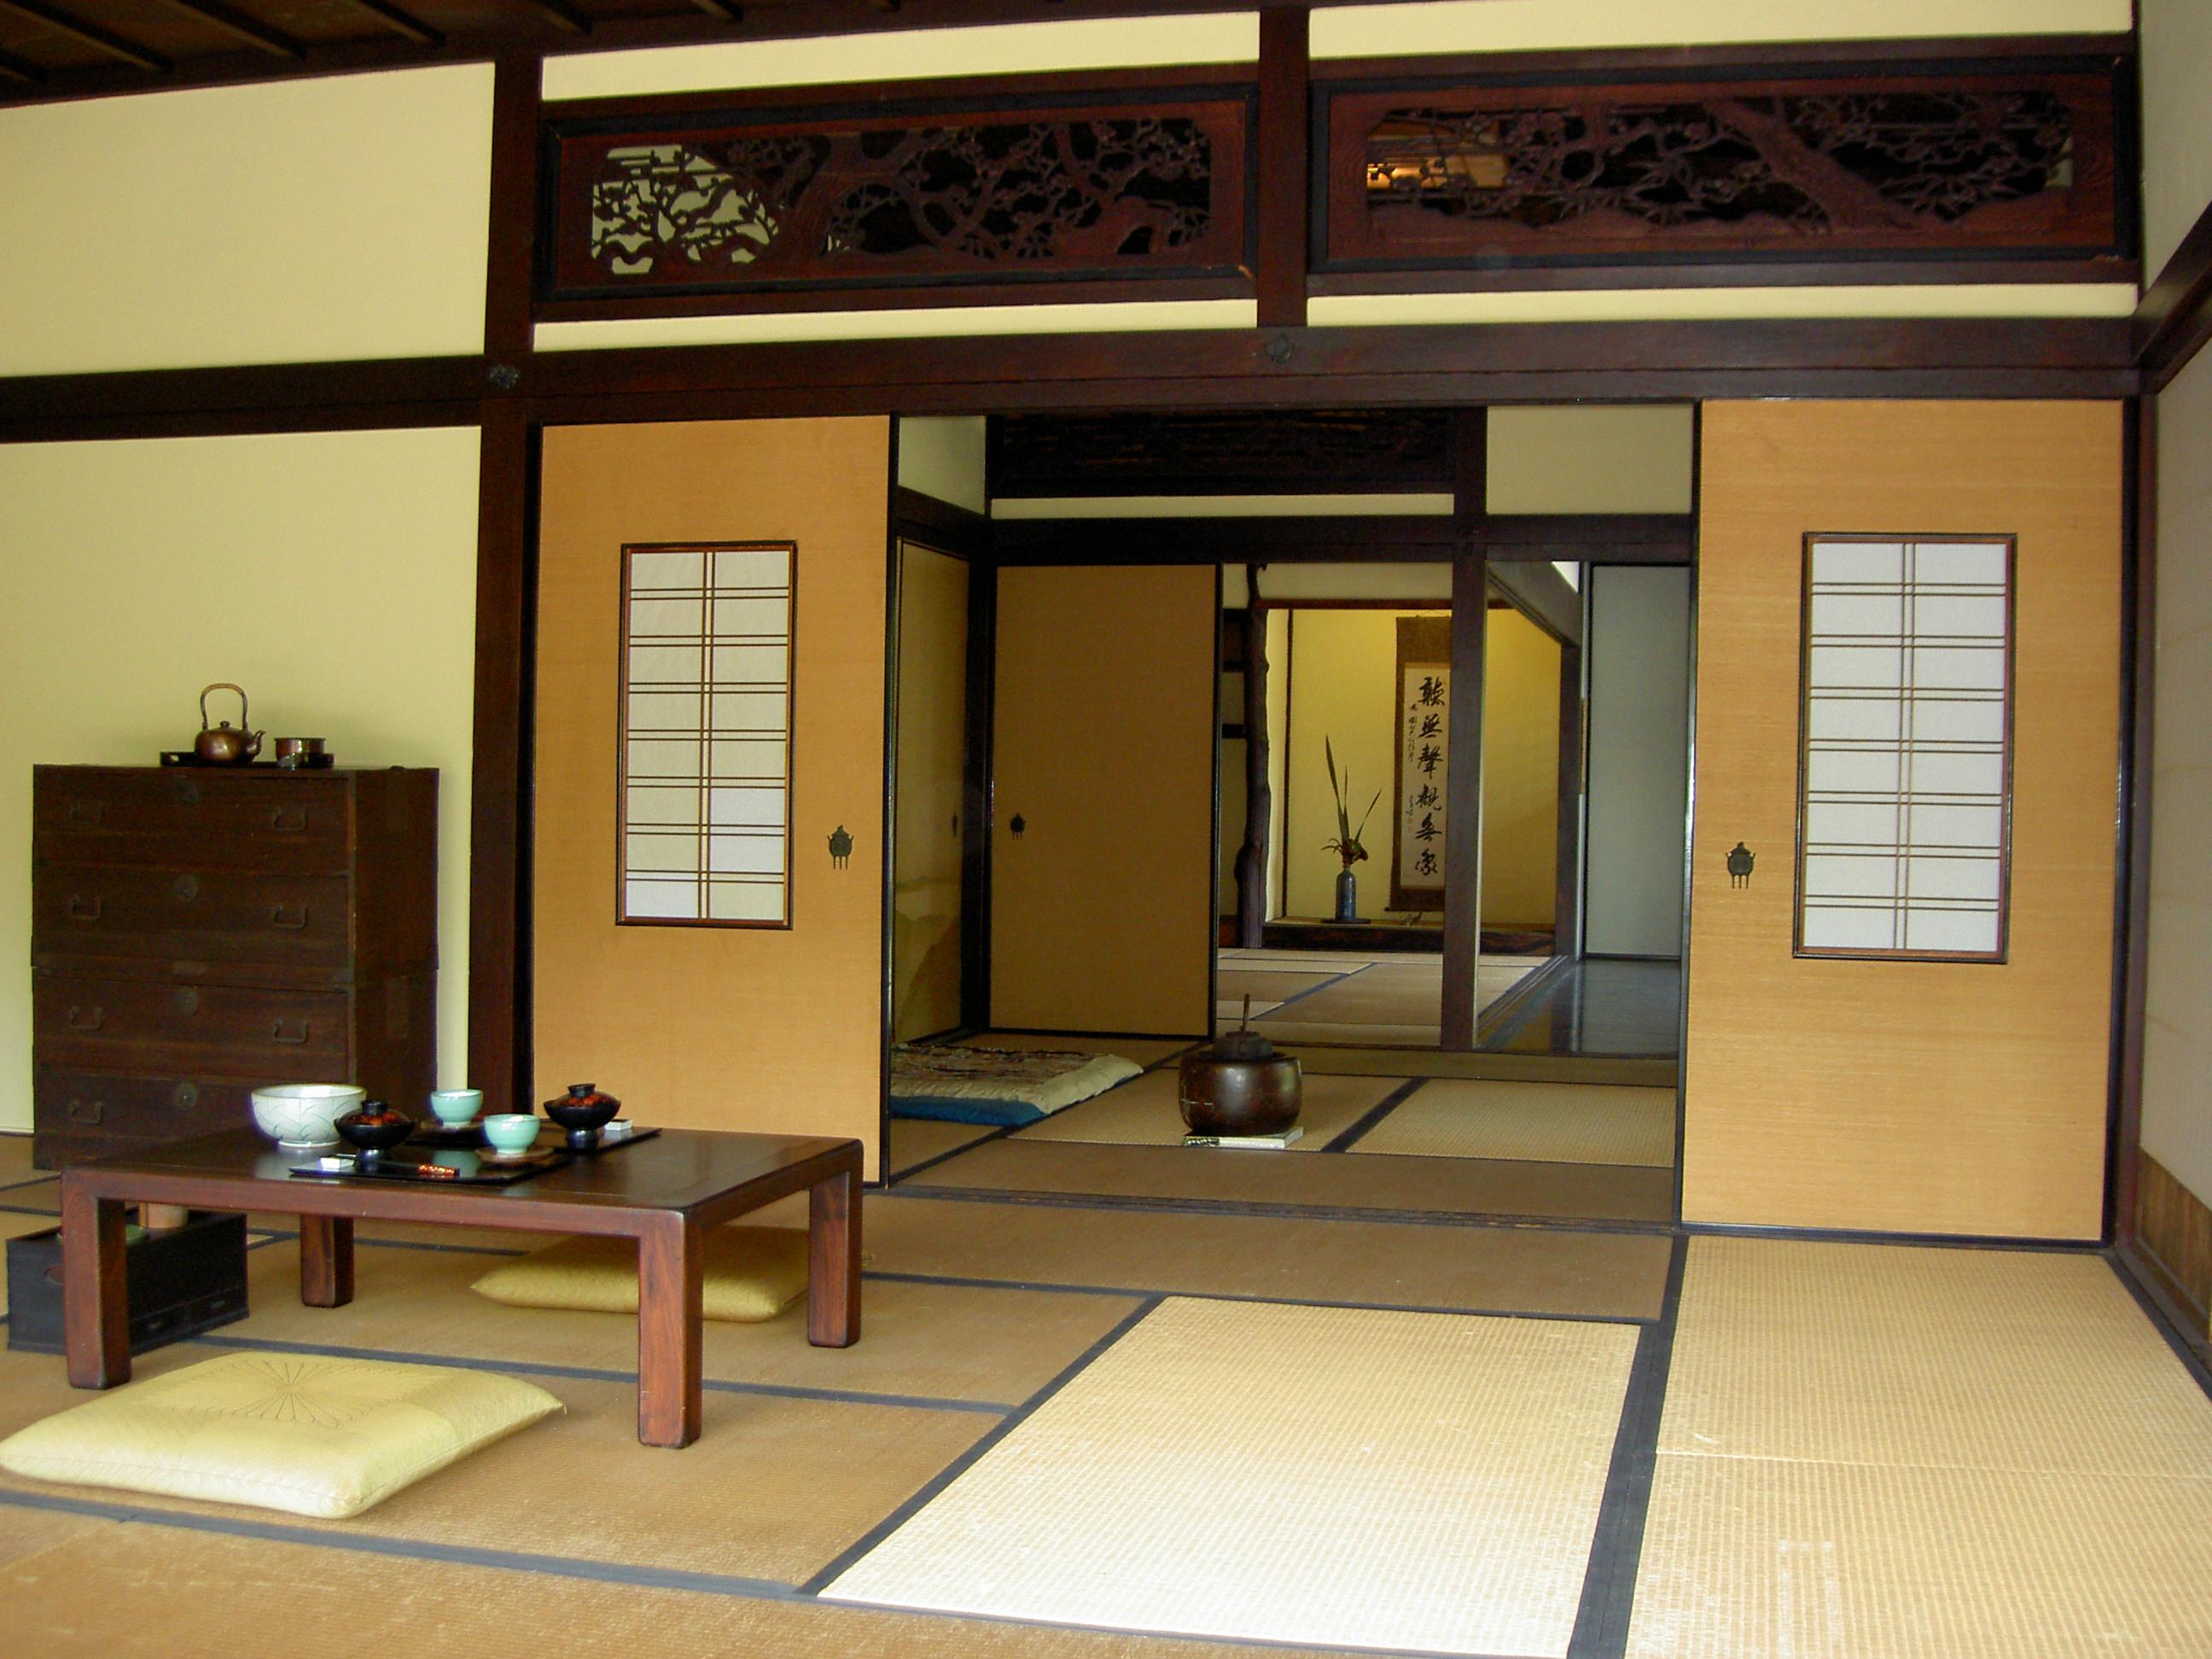 japanese house interior photo - 10